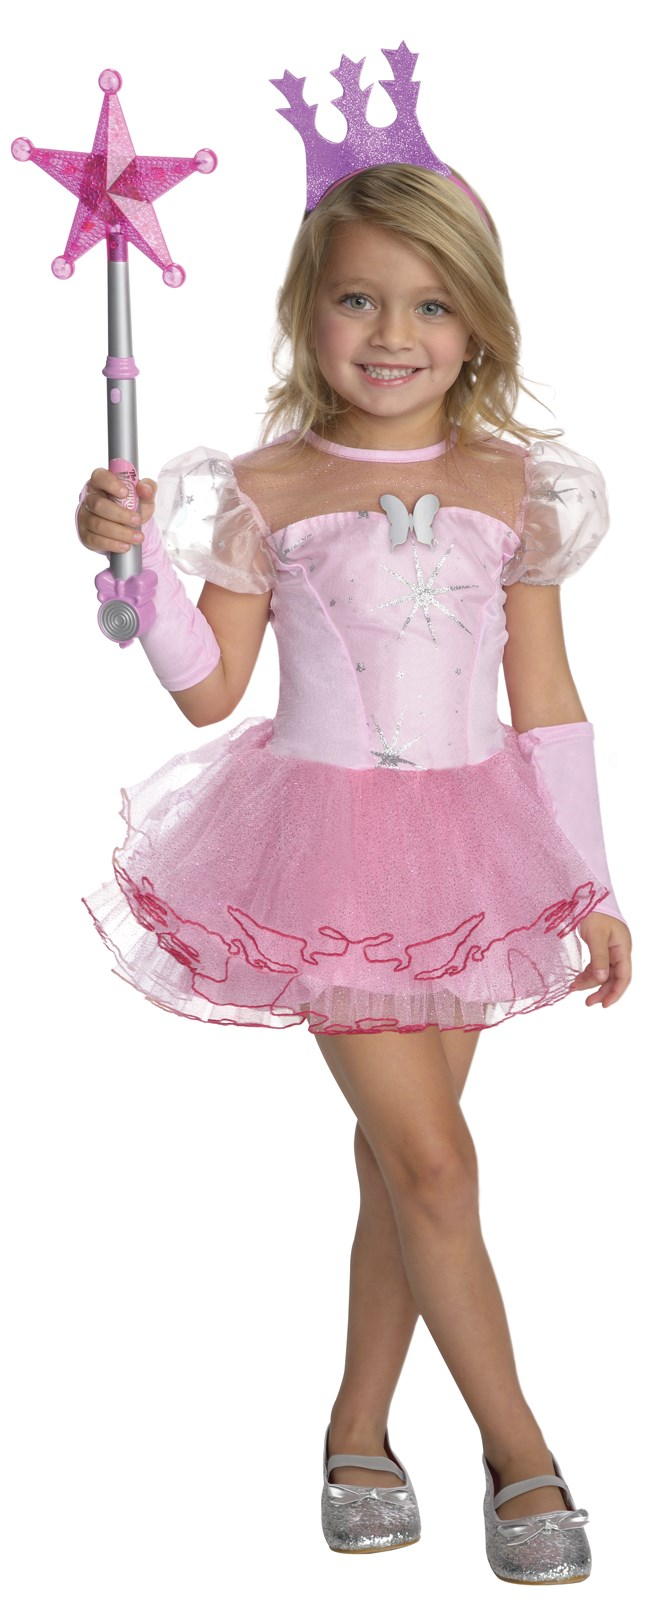 Wizard of Oz - Glinda Tutu Girls Costume | BuyCostumes.com